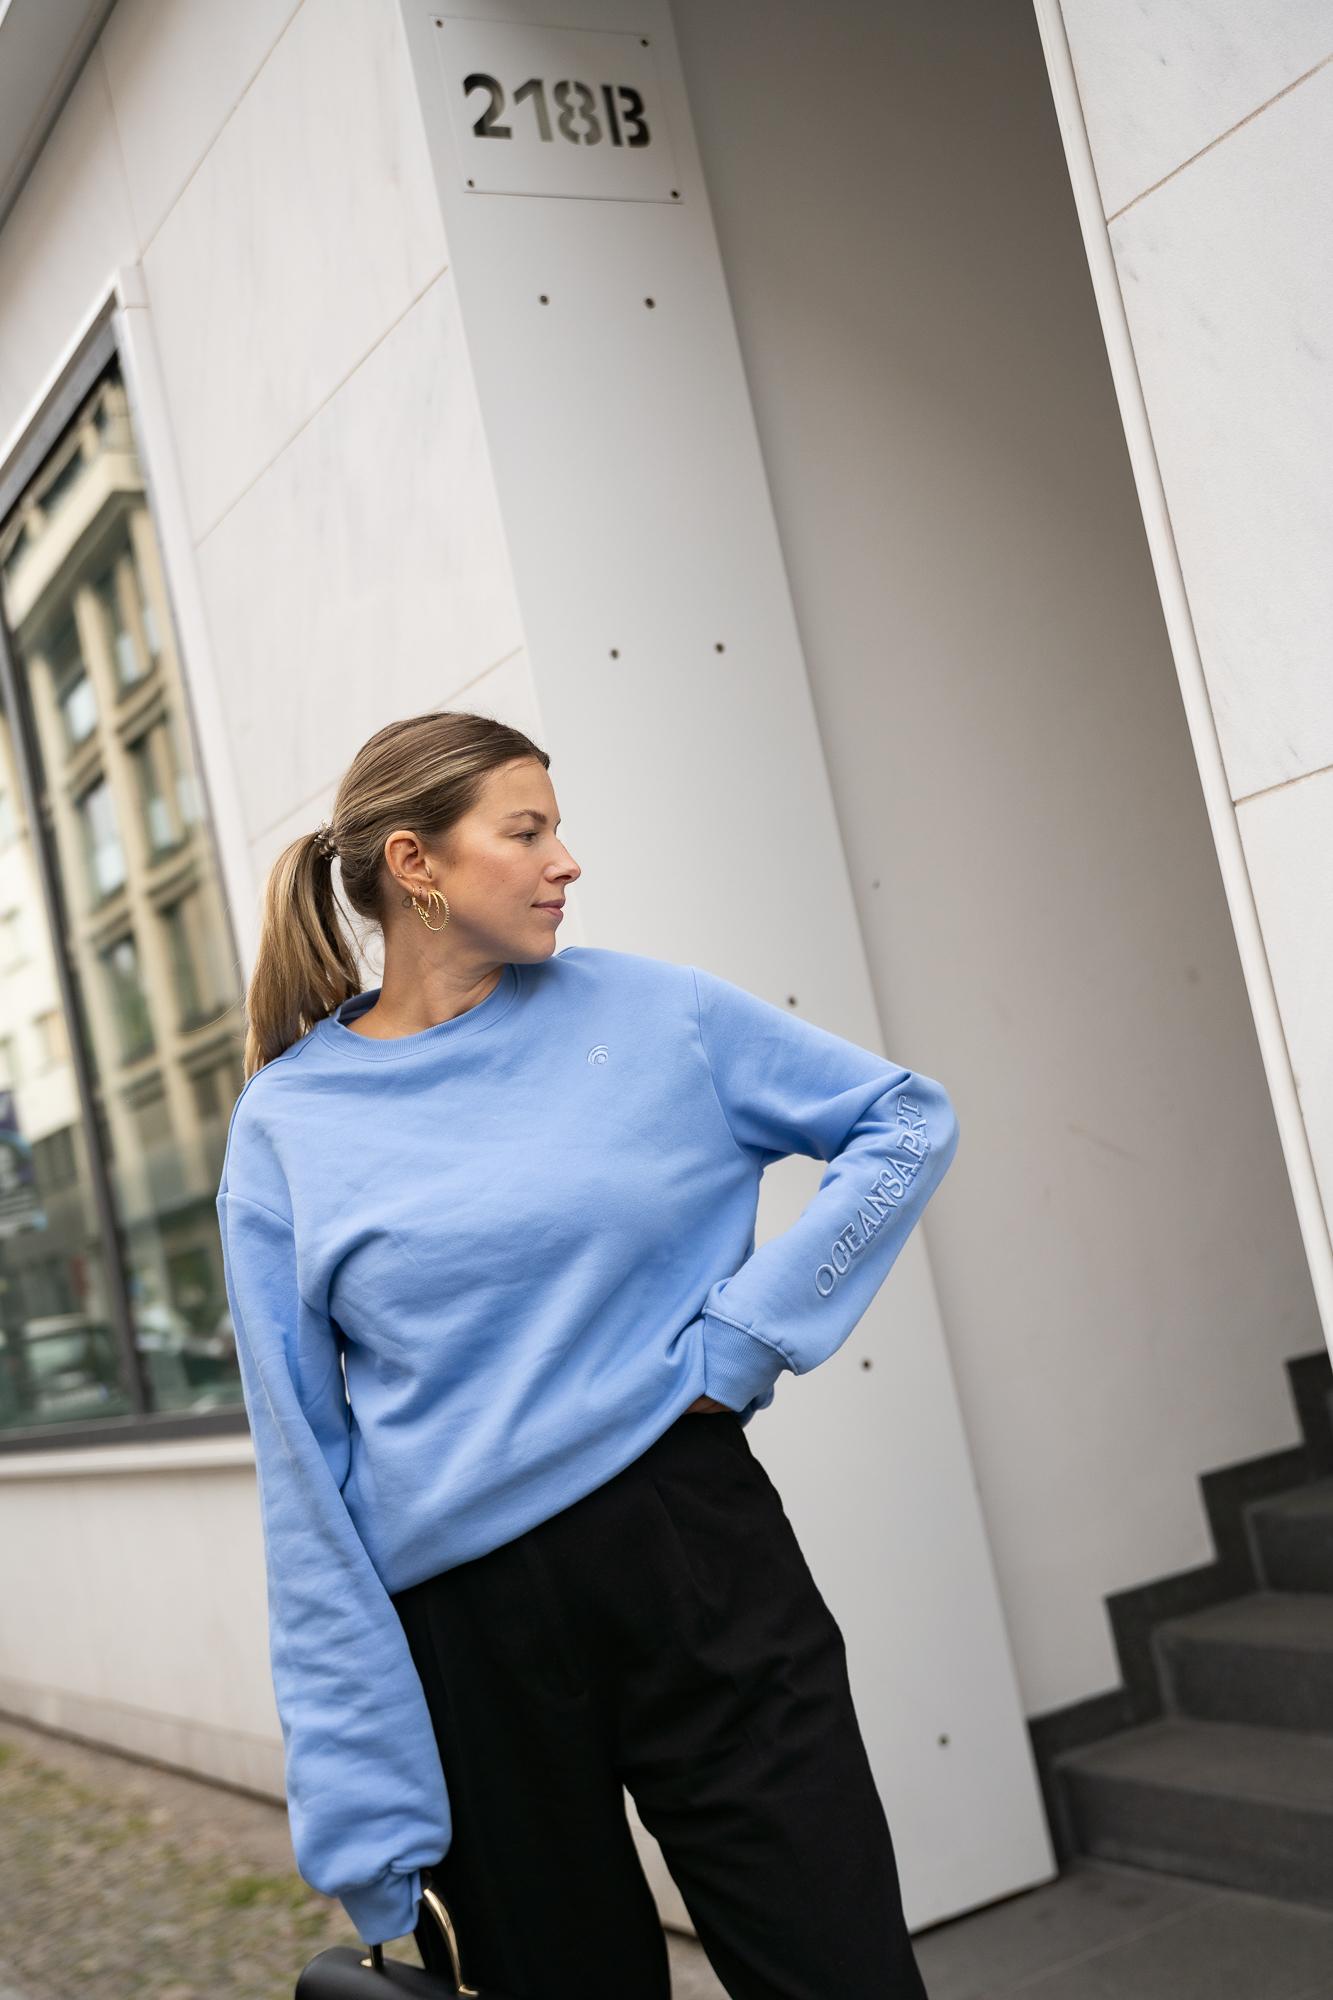 athleisure-outfits-sweater-oceansapart-oversize-sweatshirt-aline-kaplan-modeblog-berlin-3